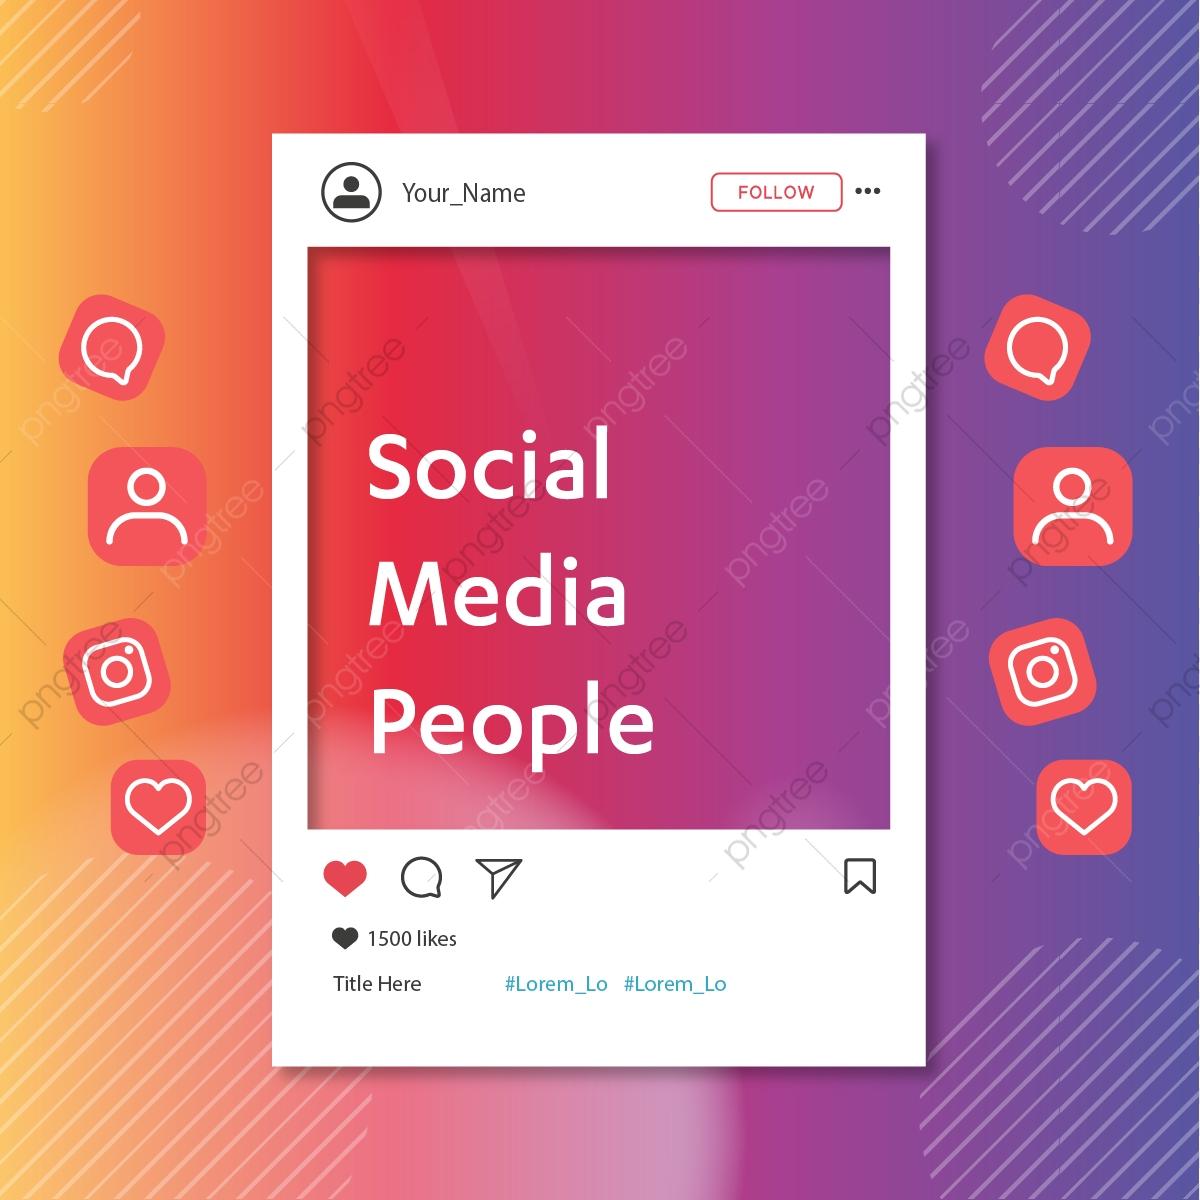 Social Media Background Icons Instagram Post Template, Instagram.